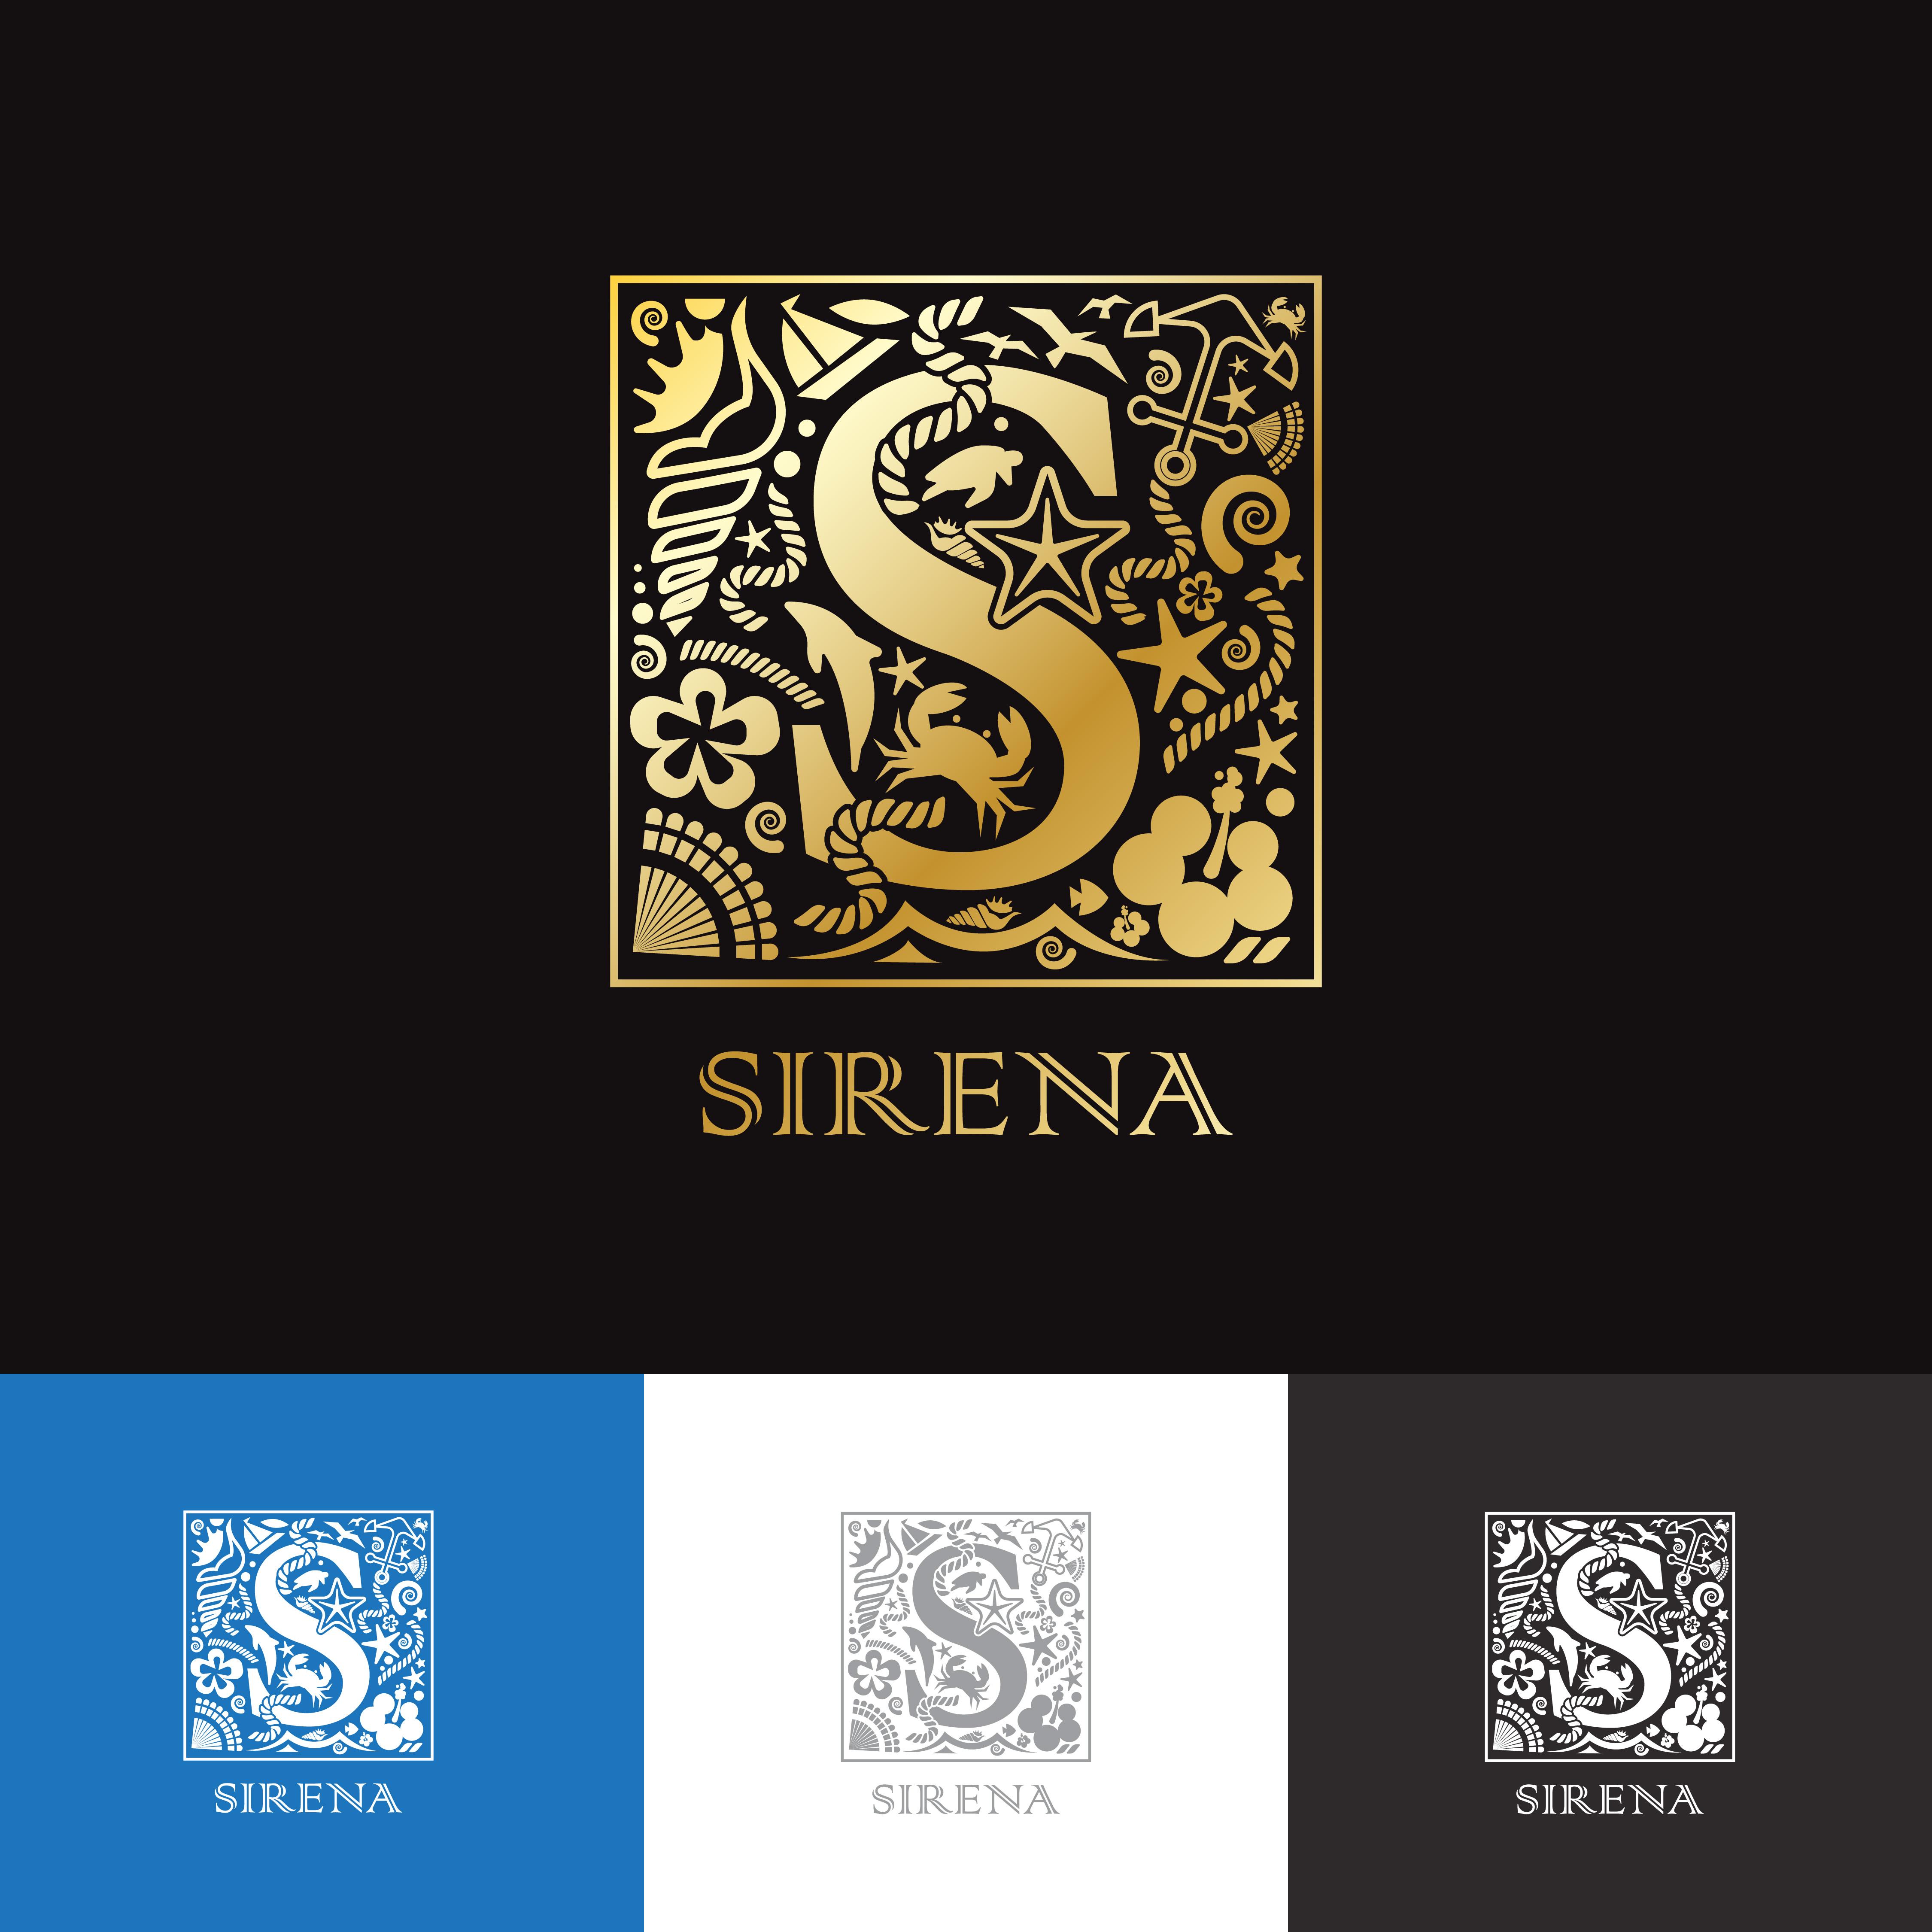 logos s sirena set